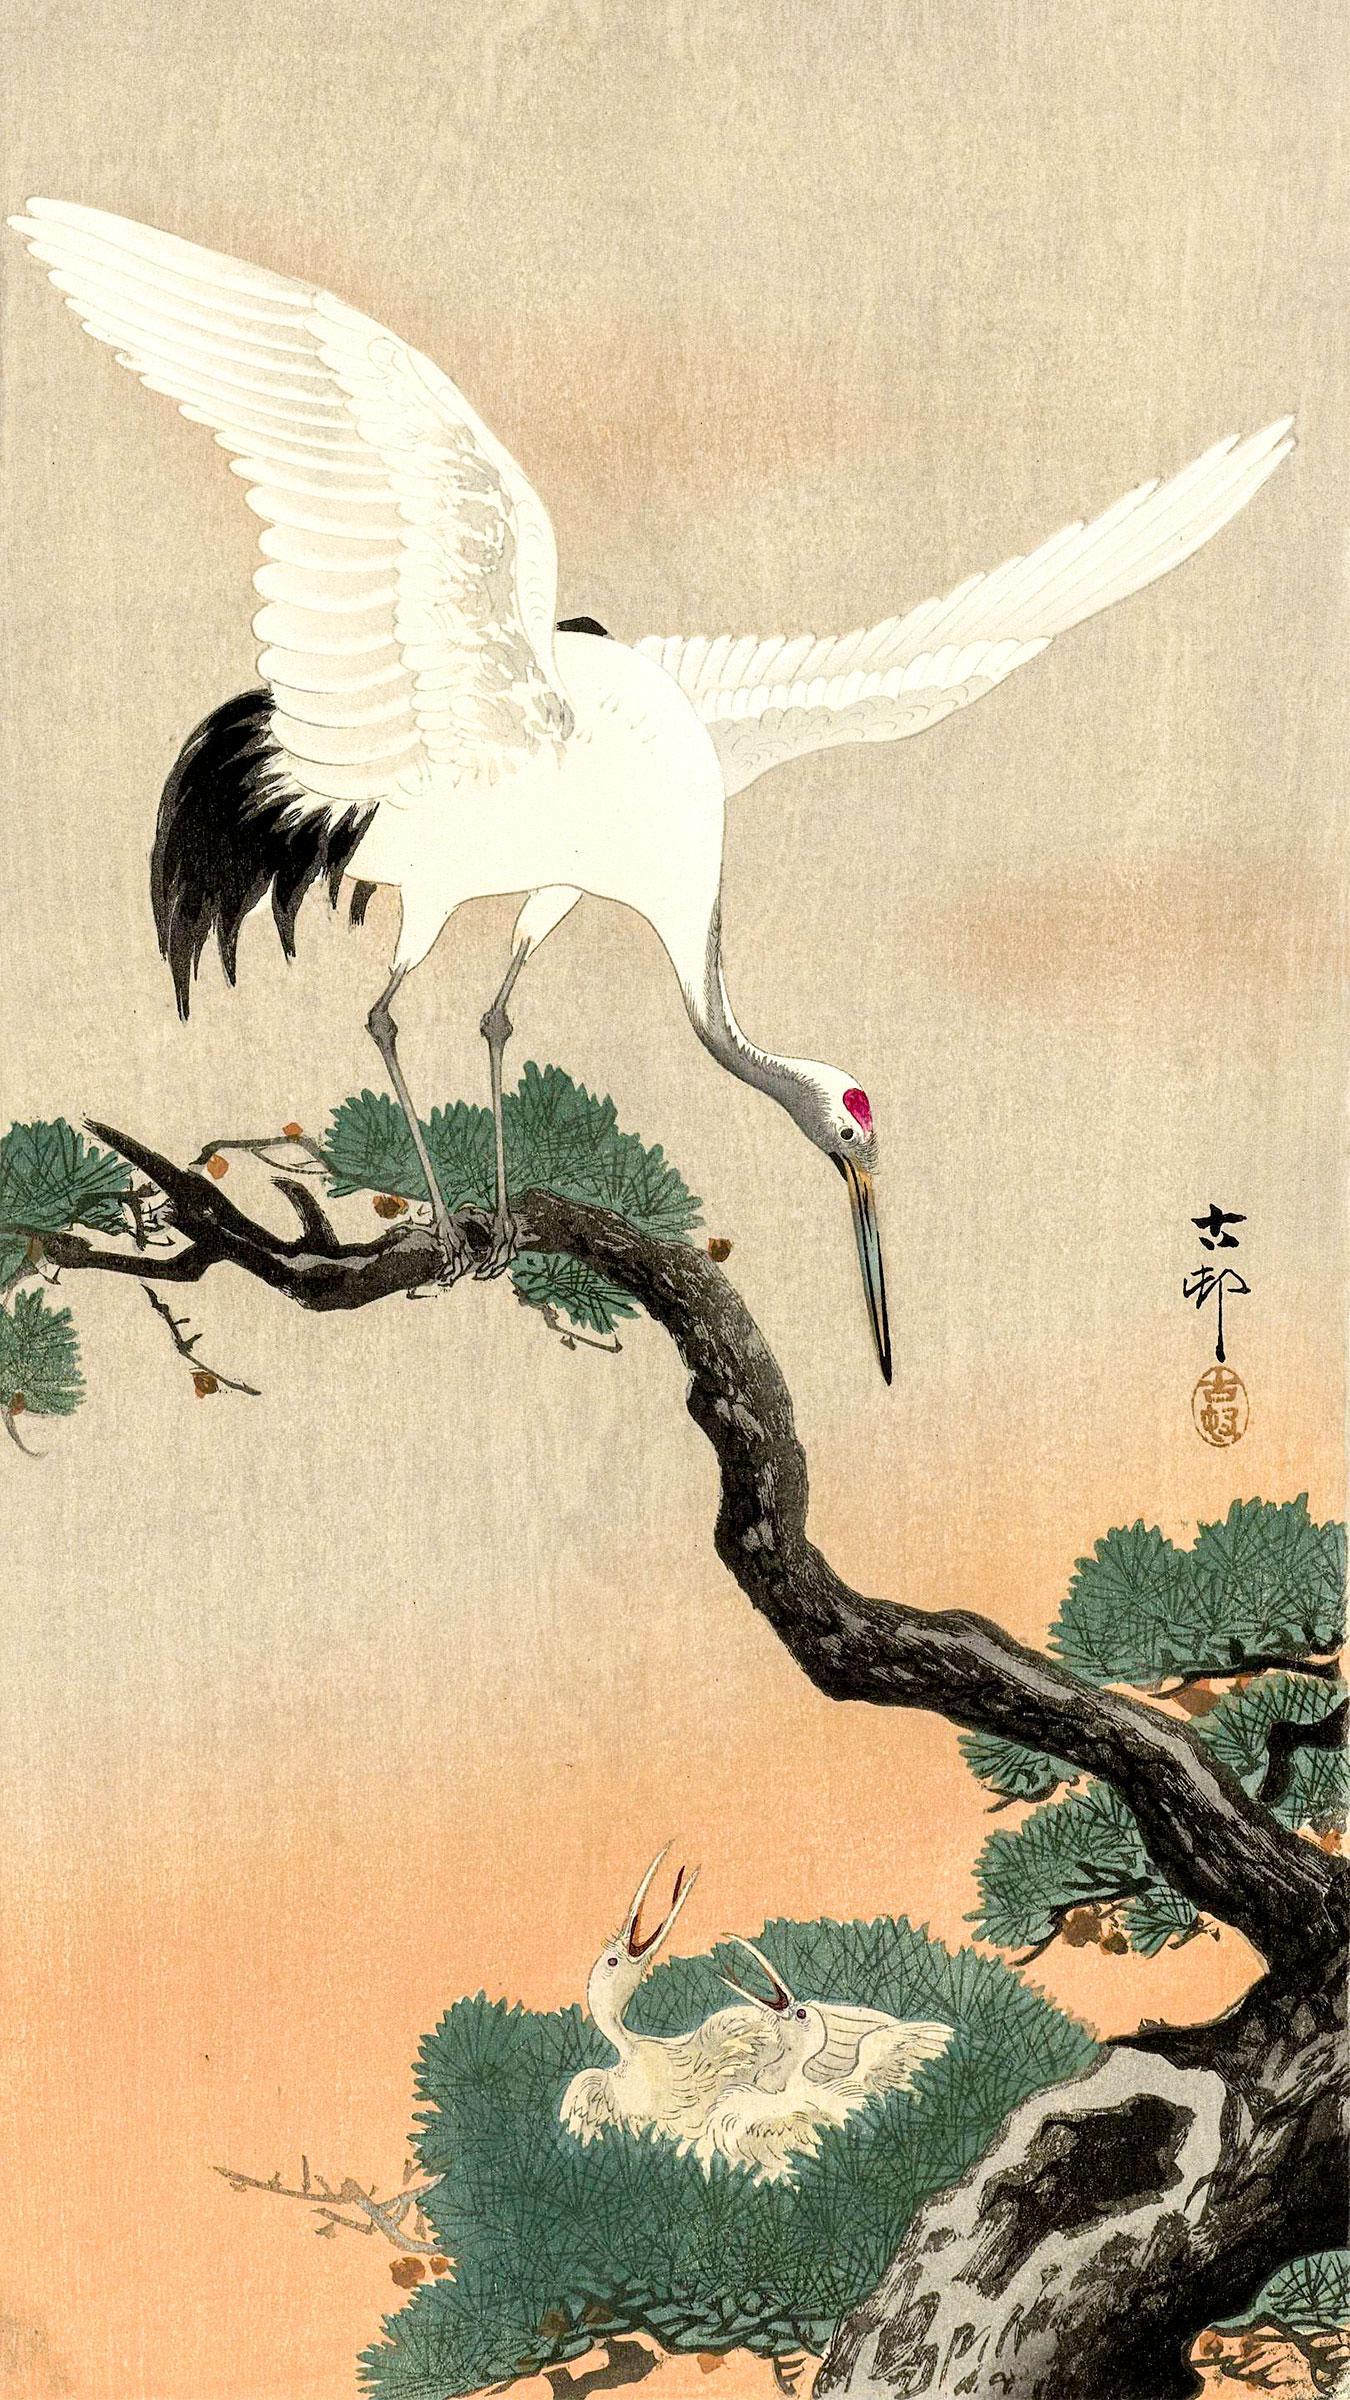 Pine tree and Crane, woodcut by Ohara Koson, 20th century Japan. Everett Collection/Alamy